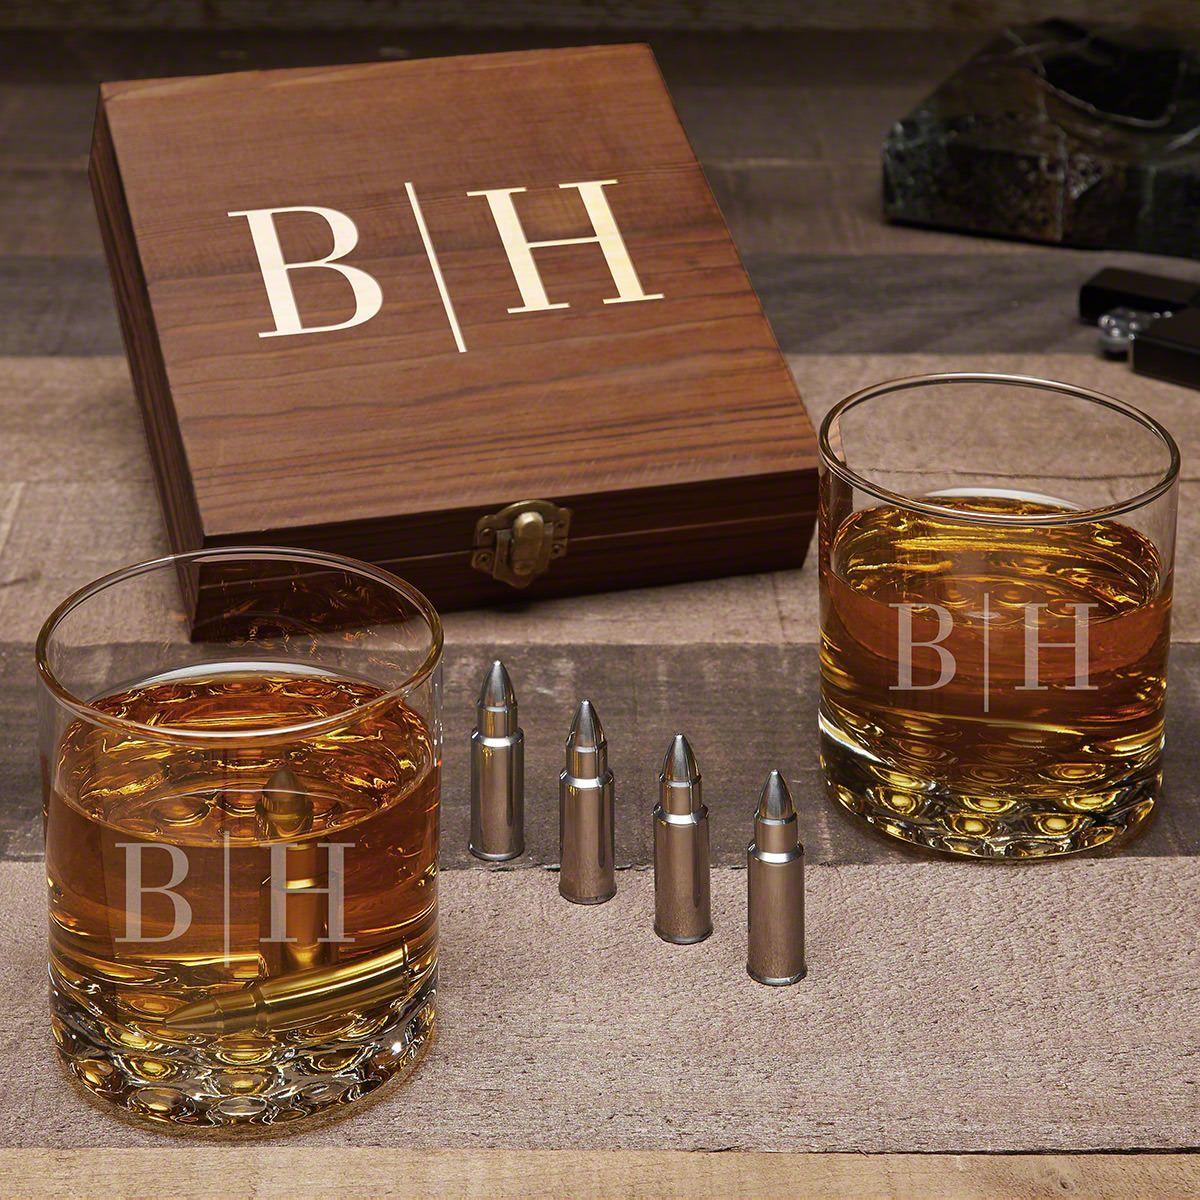 7976-quinton-monogram-buckman-glasses-with-bullet-whiskey-stones-set.jpg